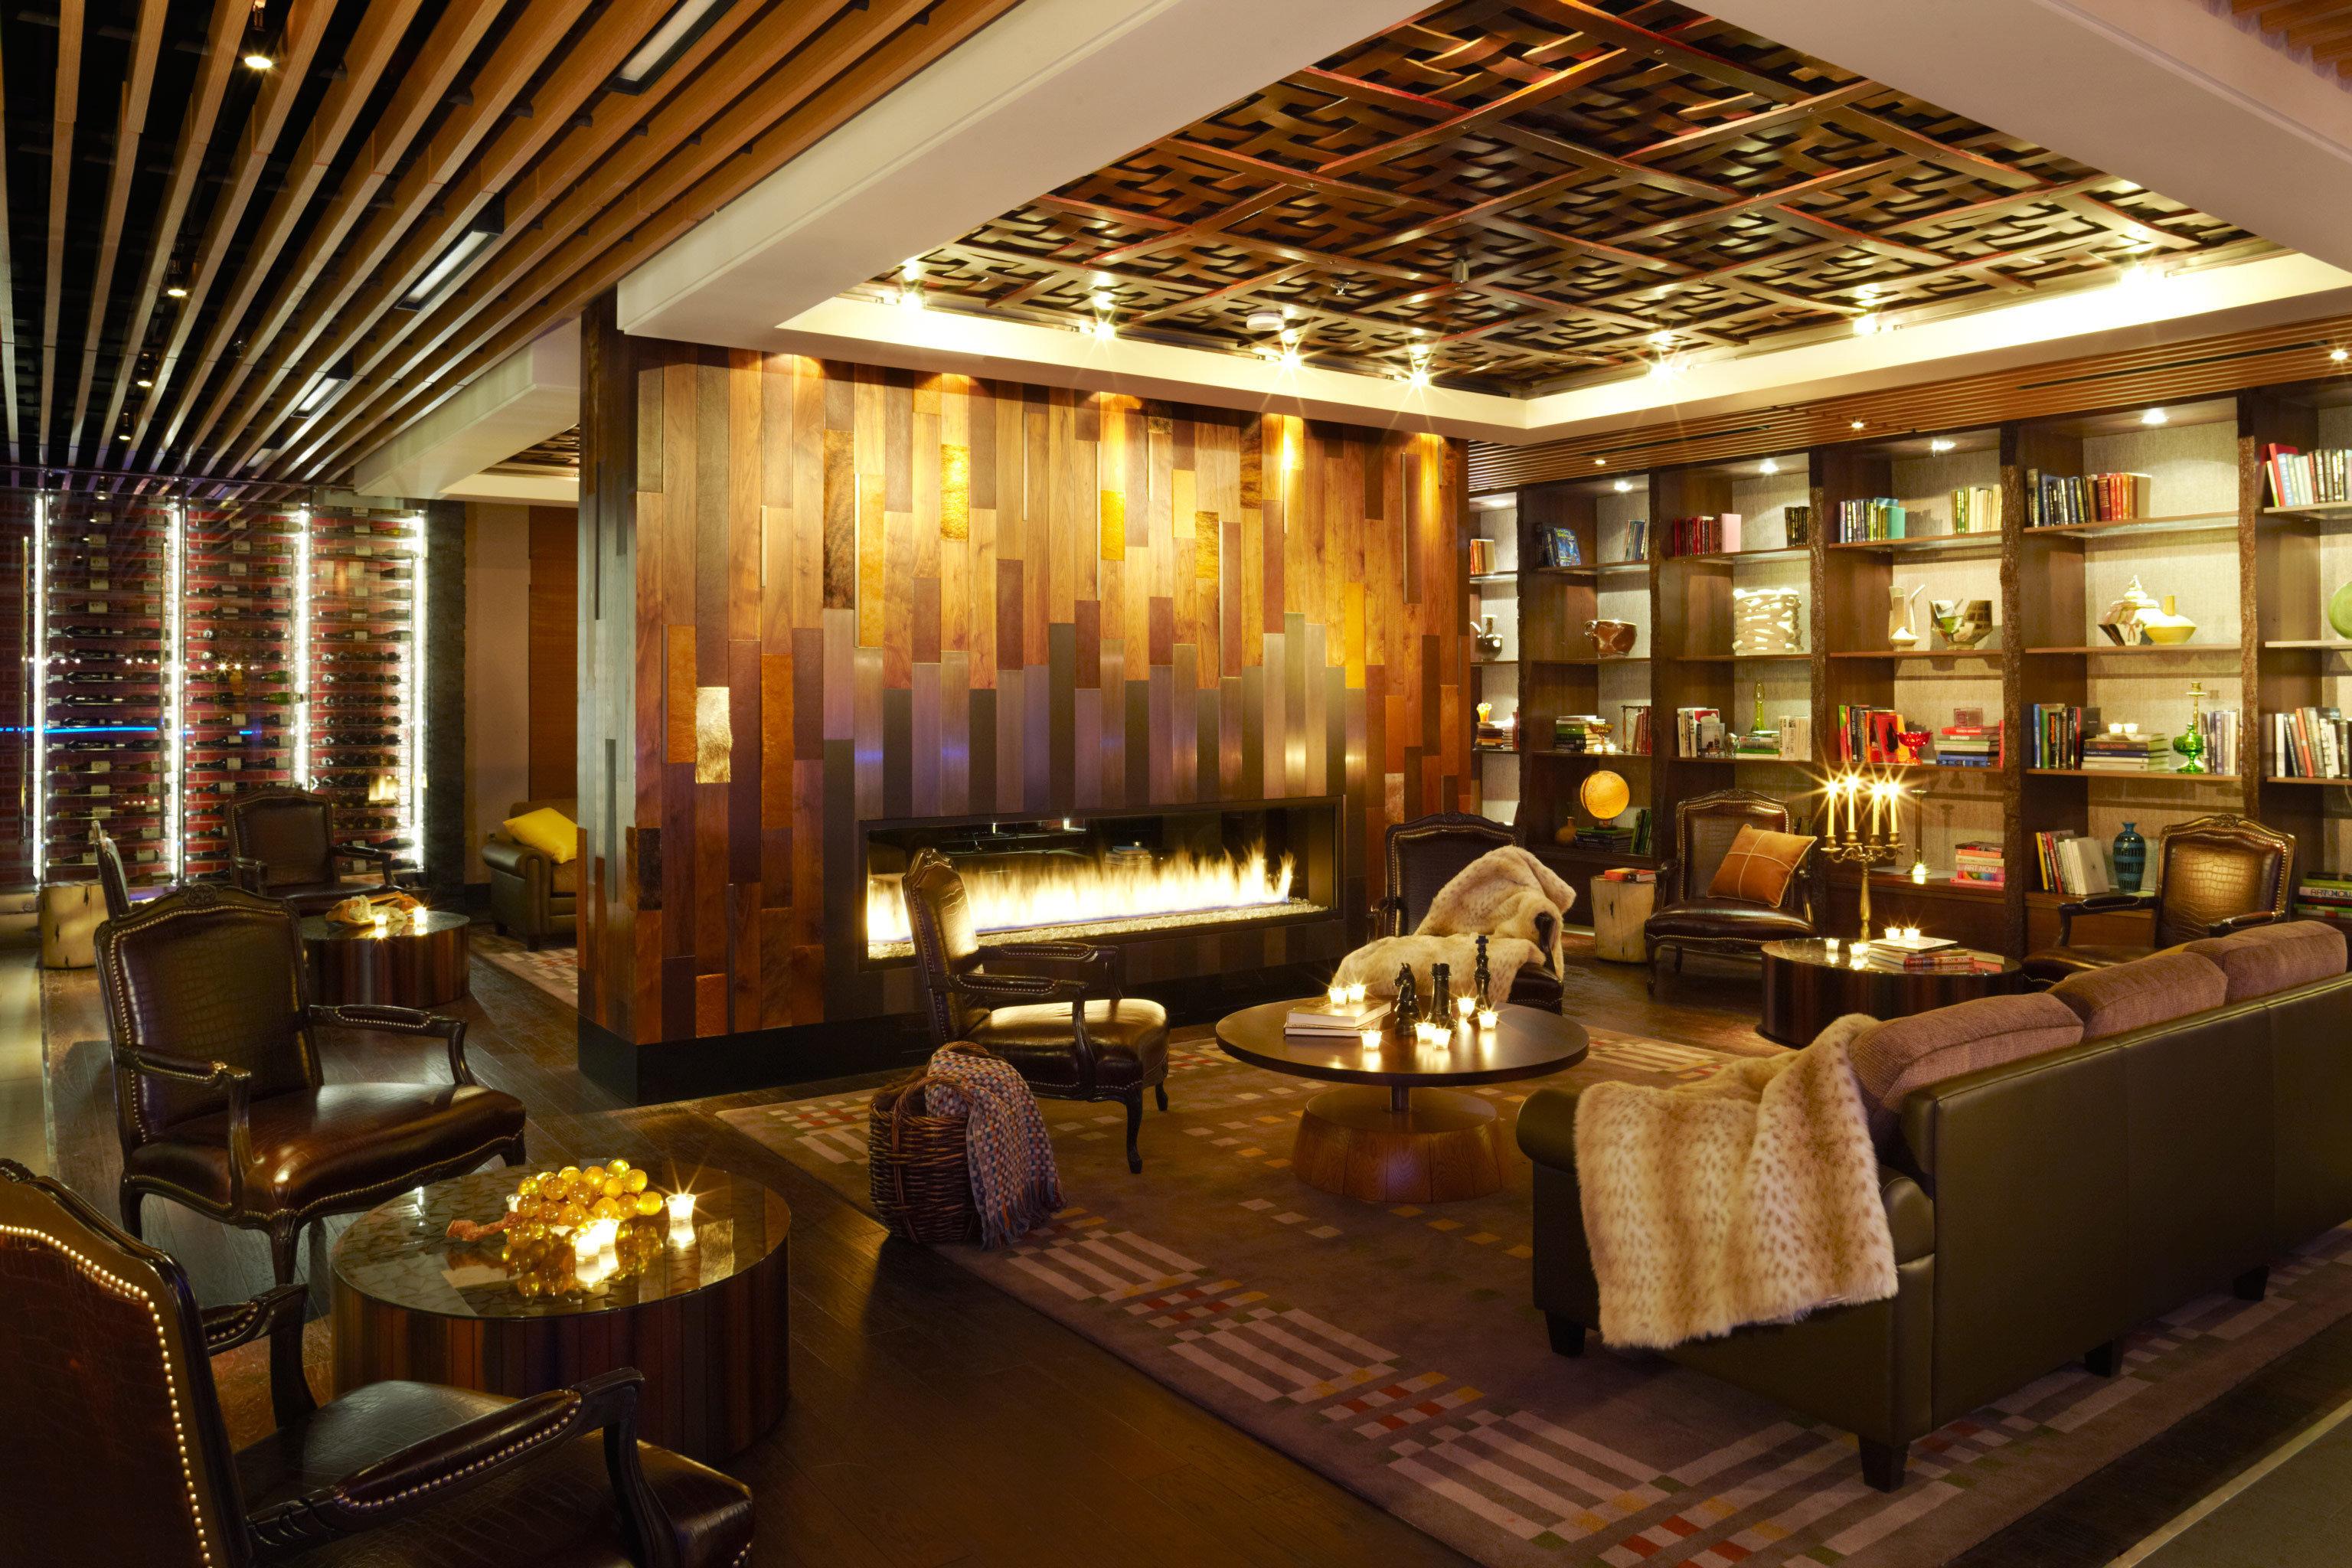 Hotels Luxury Travel Mountains + Skiing indoor ceiling room floor Living window Lobby estate interior design Bar furniture restaurant recreation room function hall living room area several